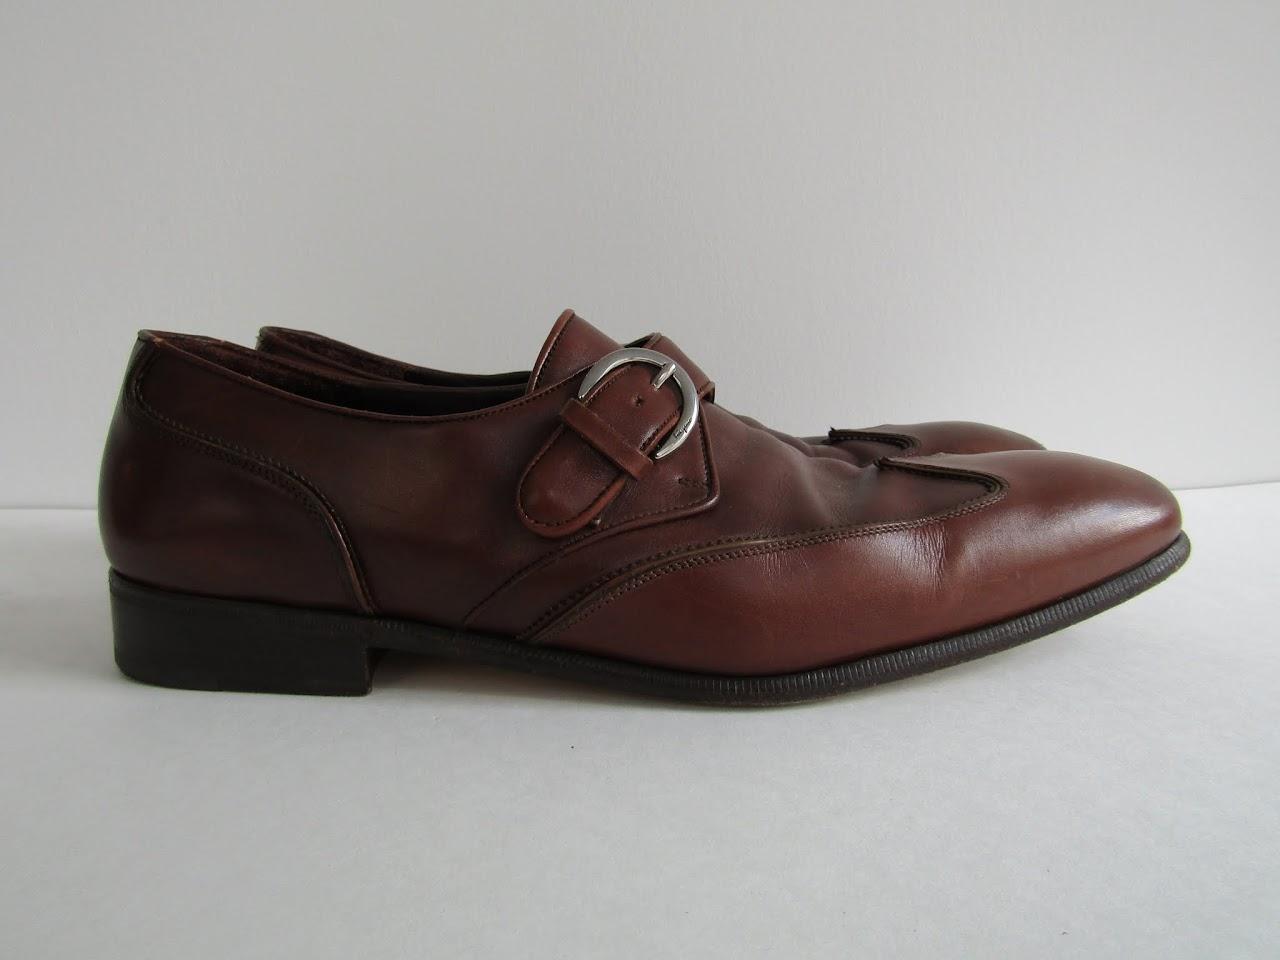 Salvatore Ferragamo Monk Strap Wingtip Shoes